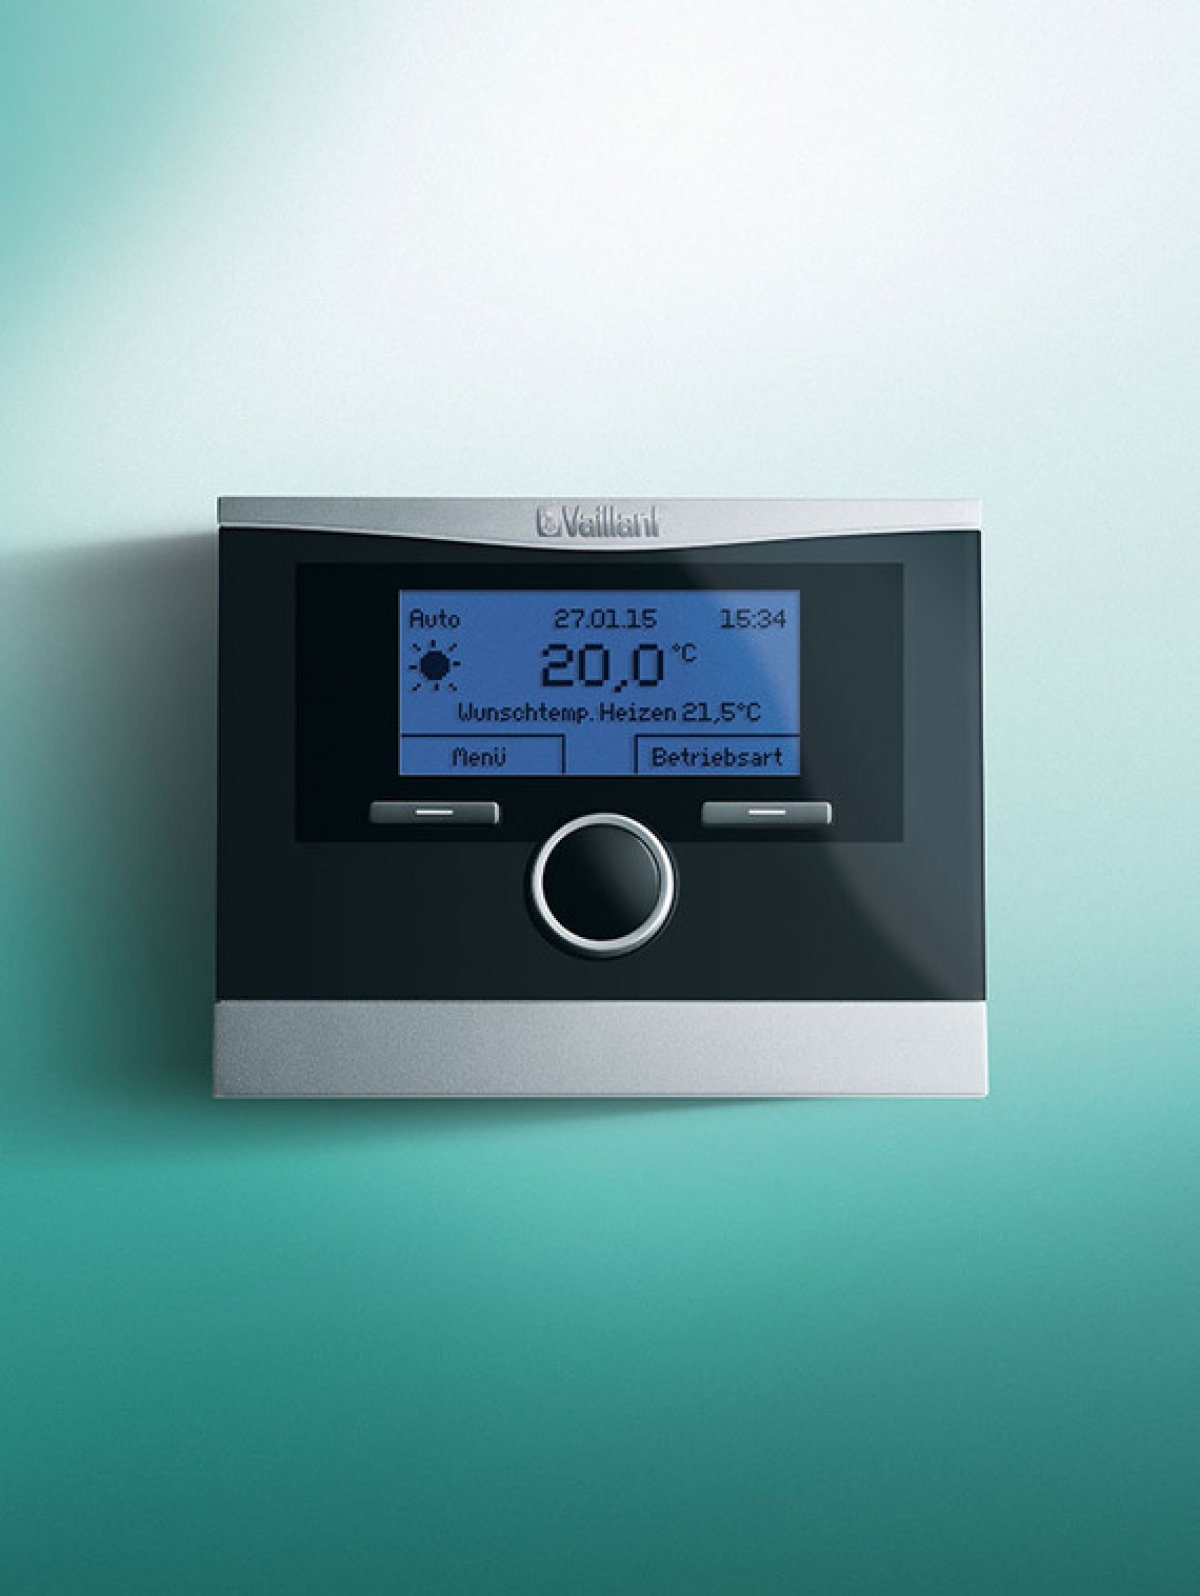 vaillant calormatic vrt 370 thermostat d 39 ambiance. Black Bedroom Furniture Sets. Home Design Ideas